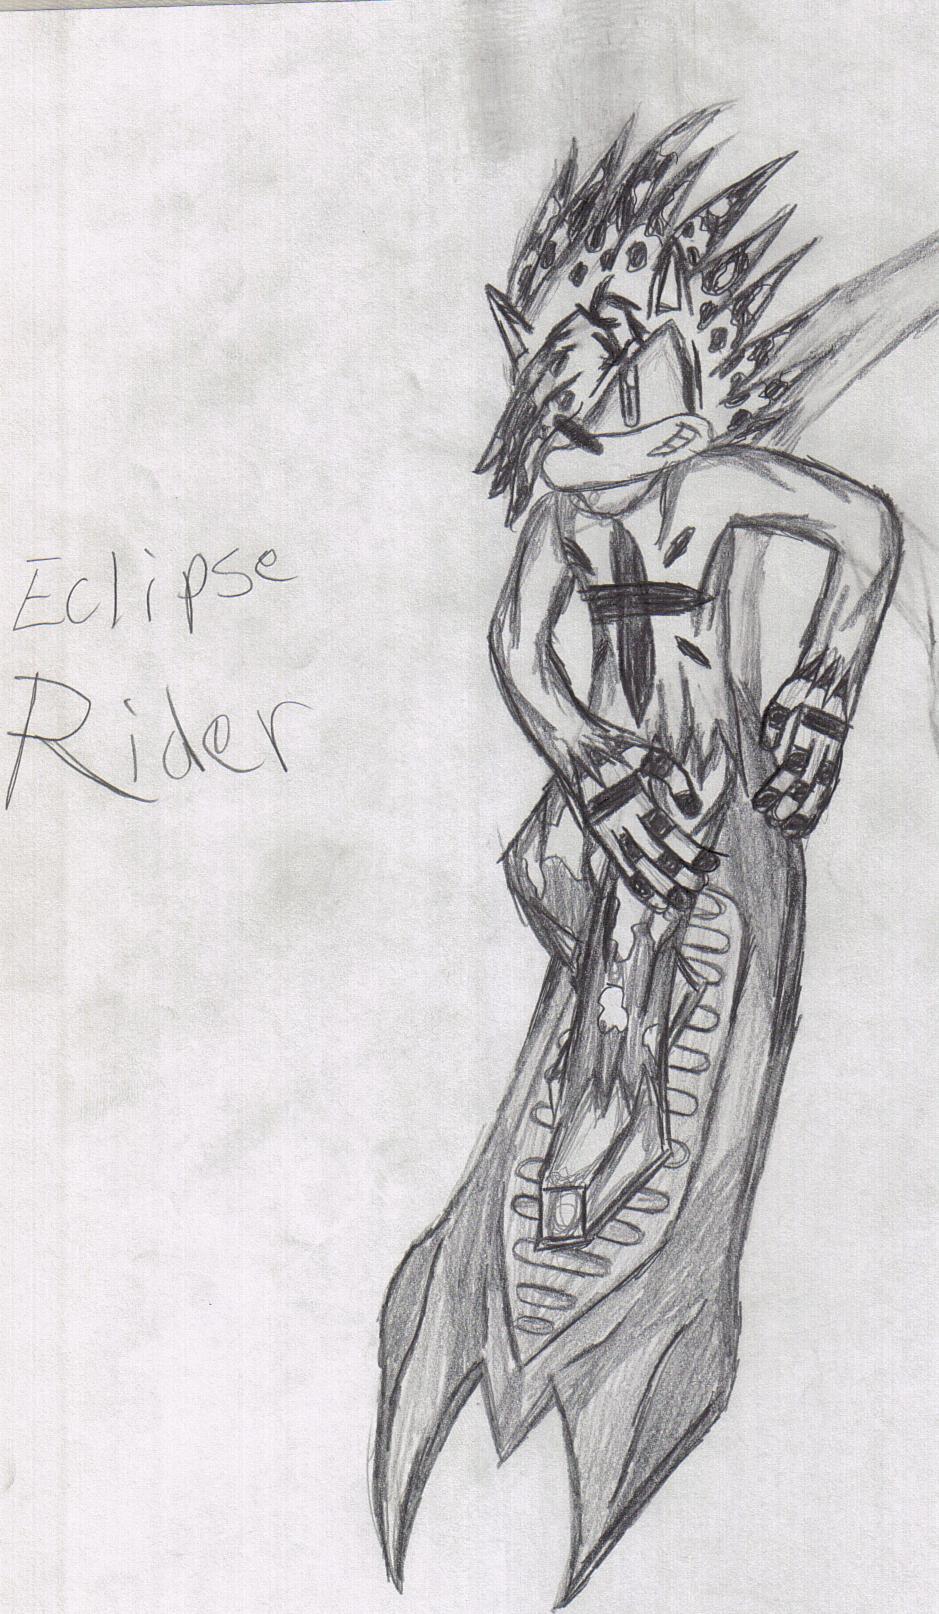 Eclipse Rider by eclipsethehedgehog